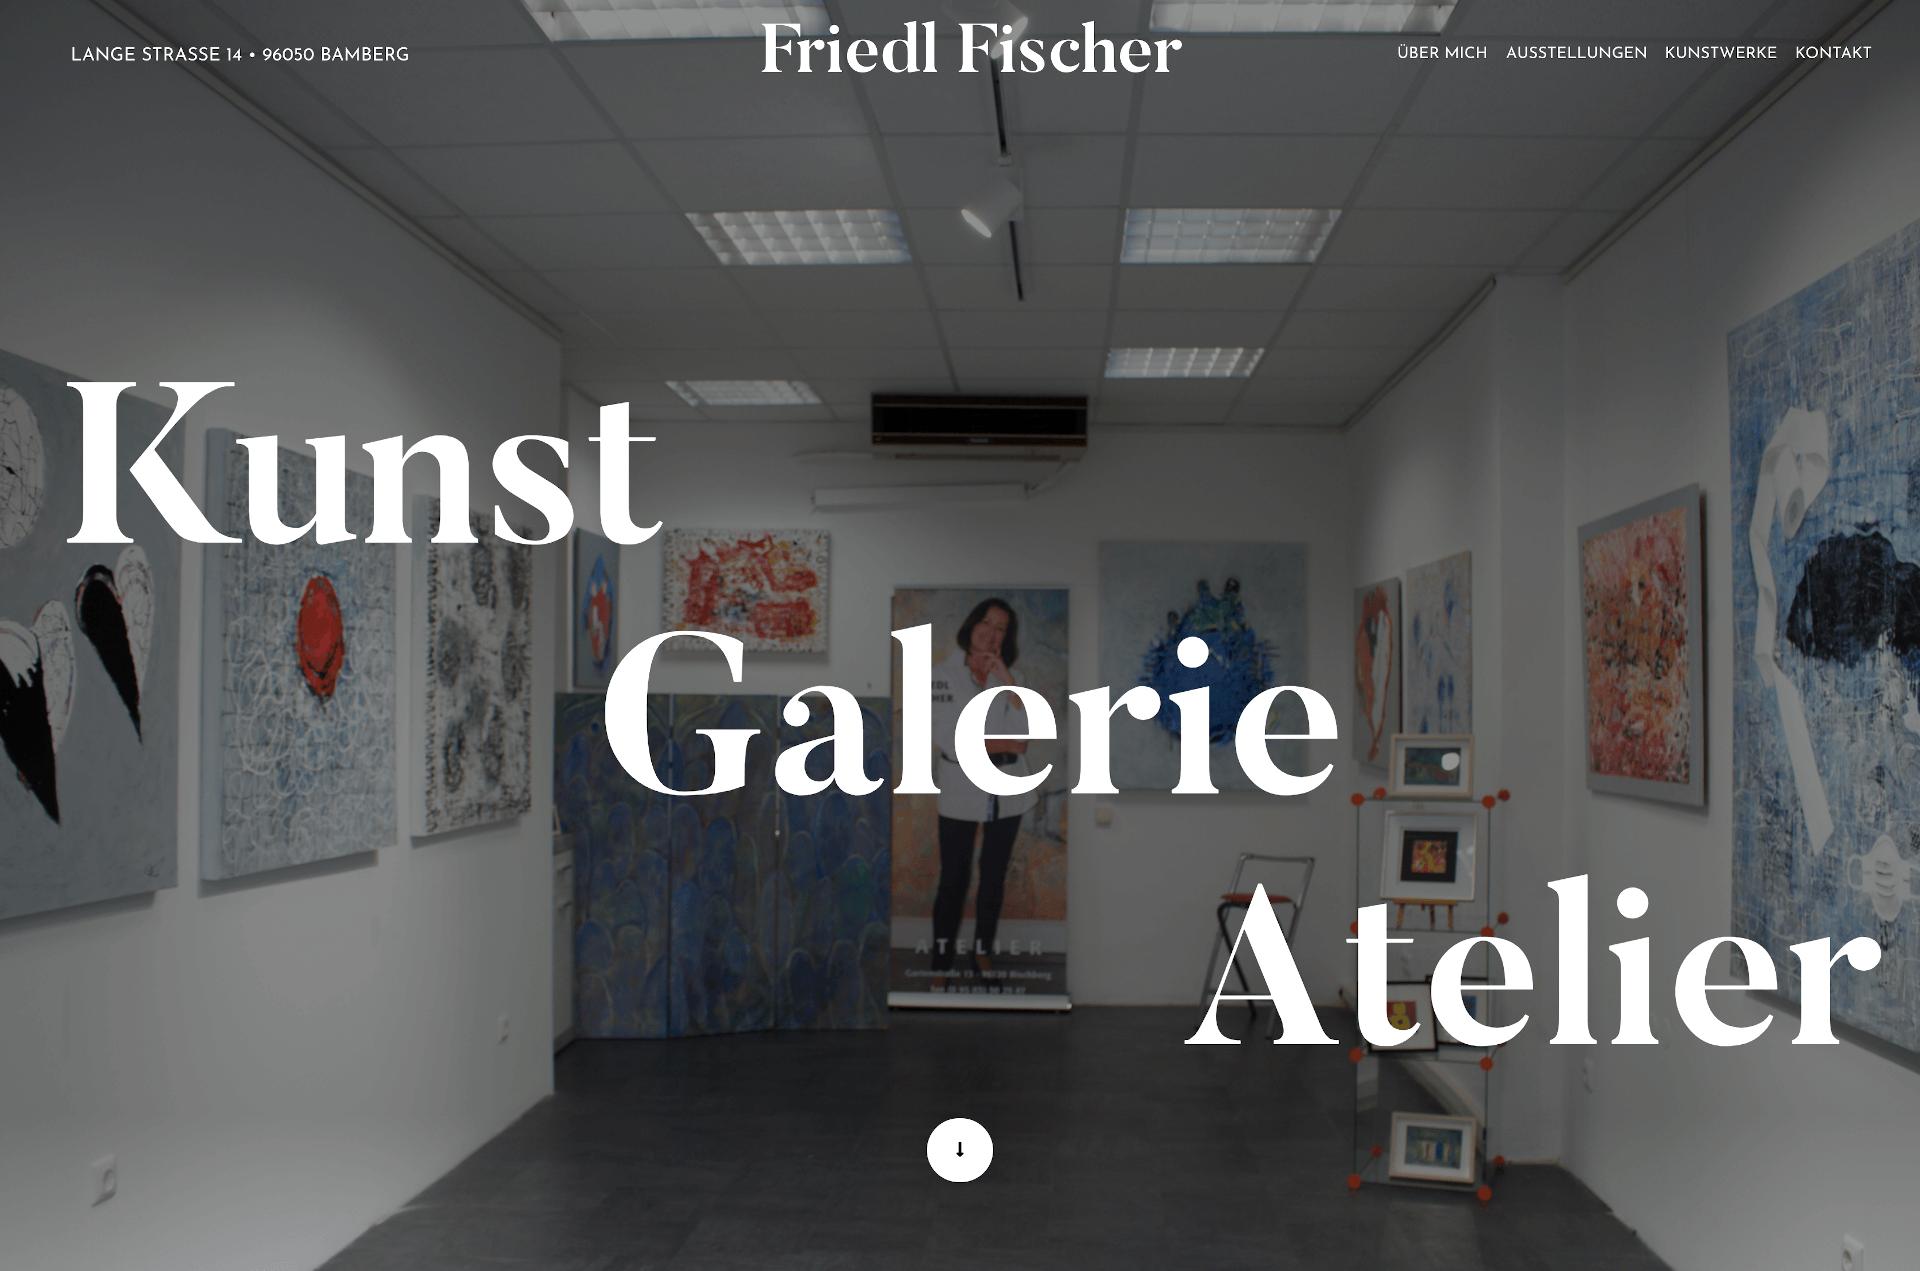 Fried-Fischer-Website